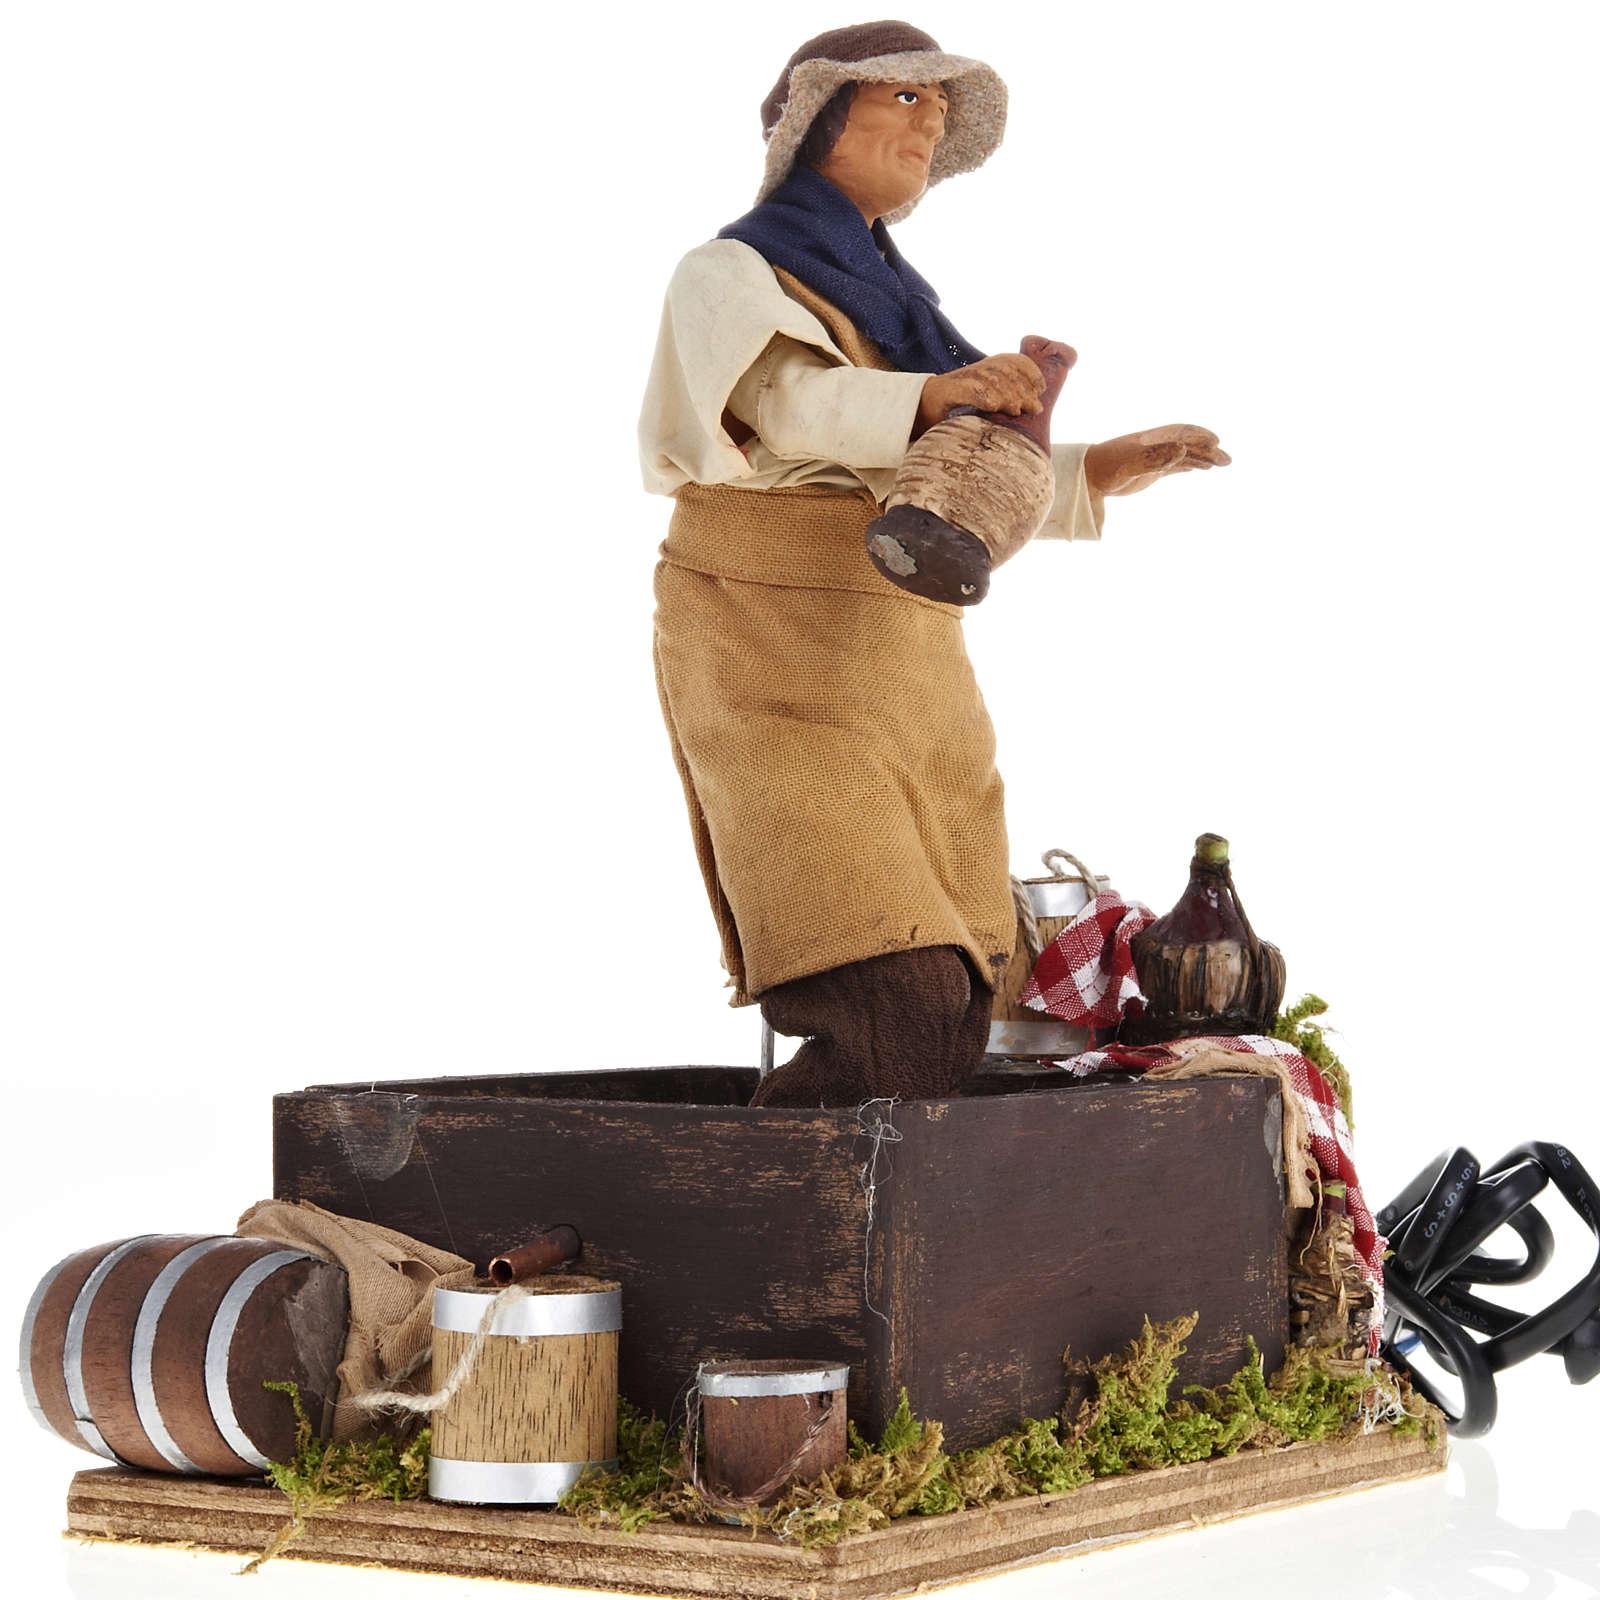 Animated Nativity scene figurine,  grape stomping man 14 cm 4